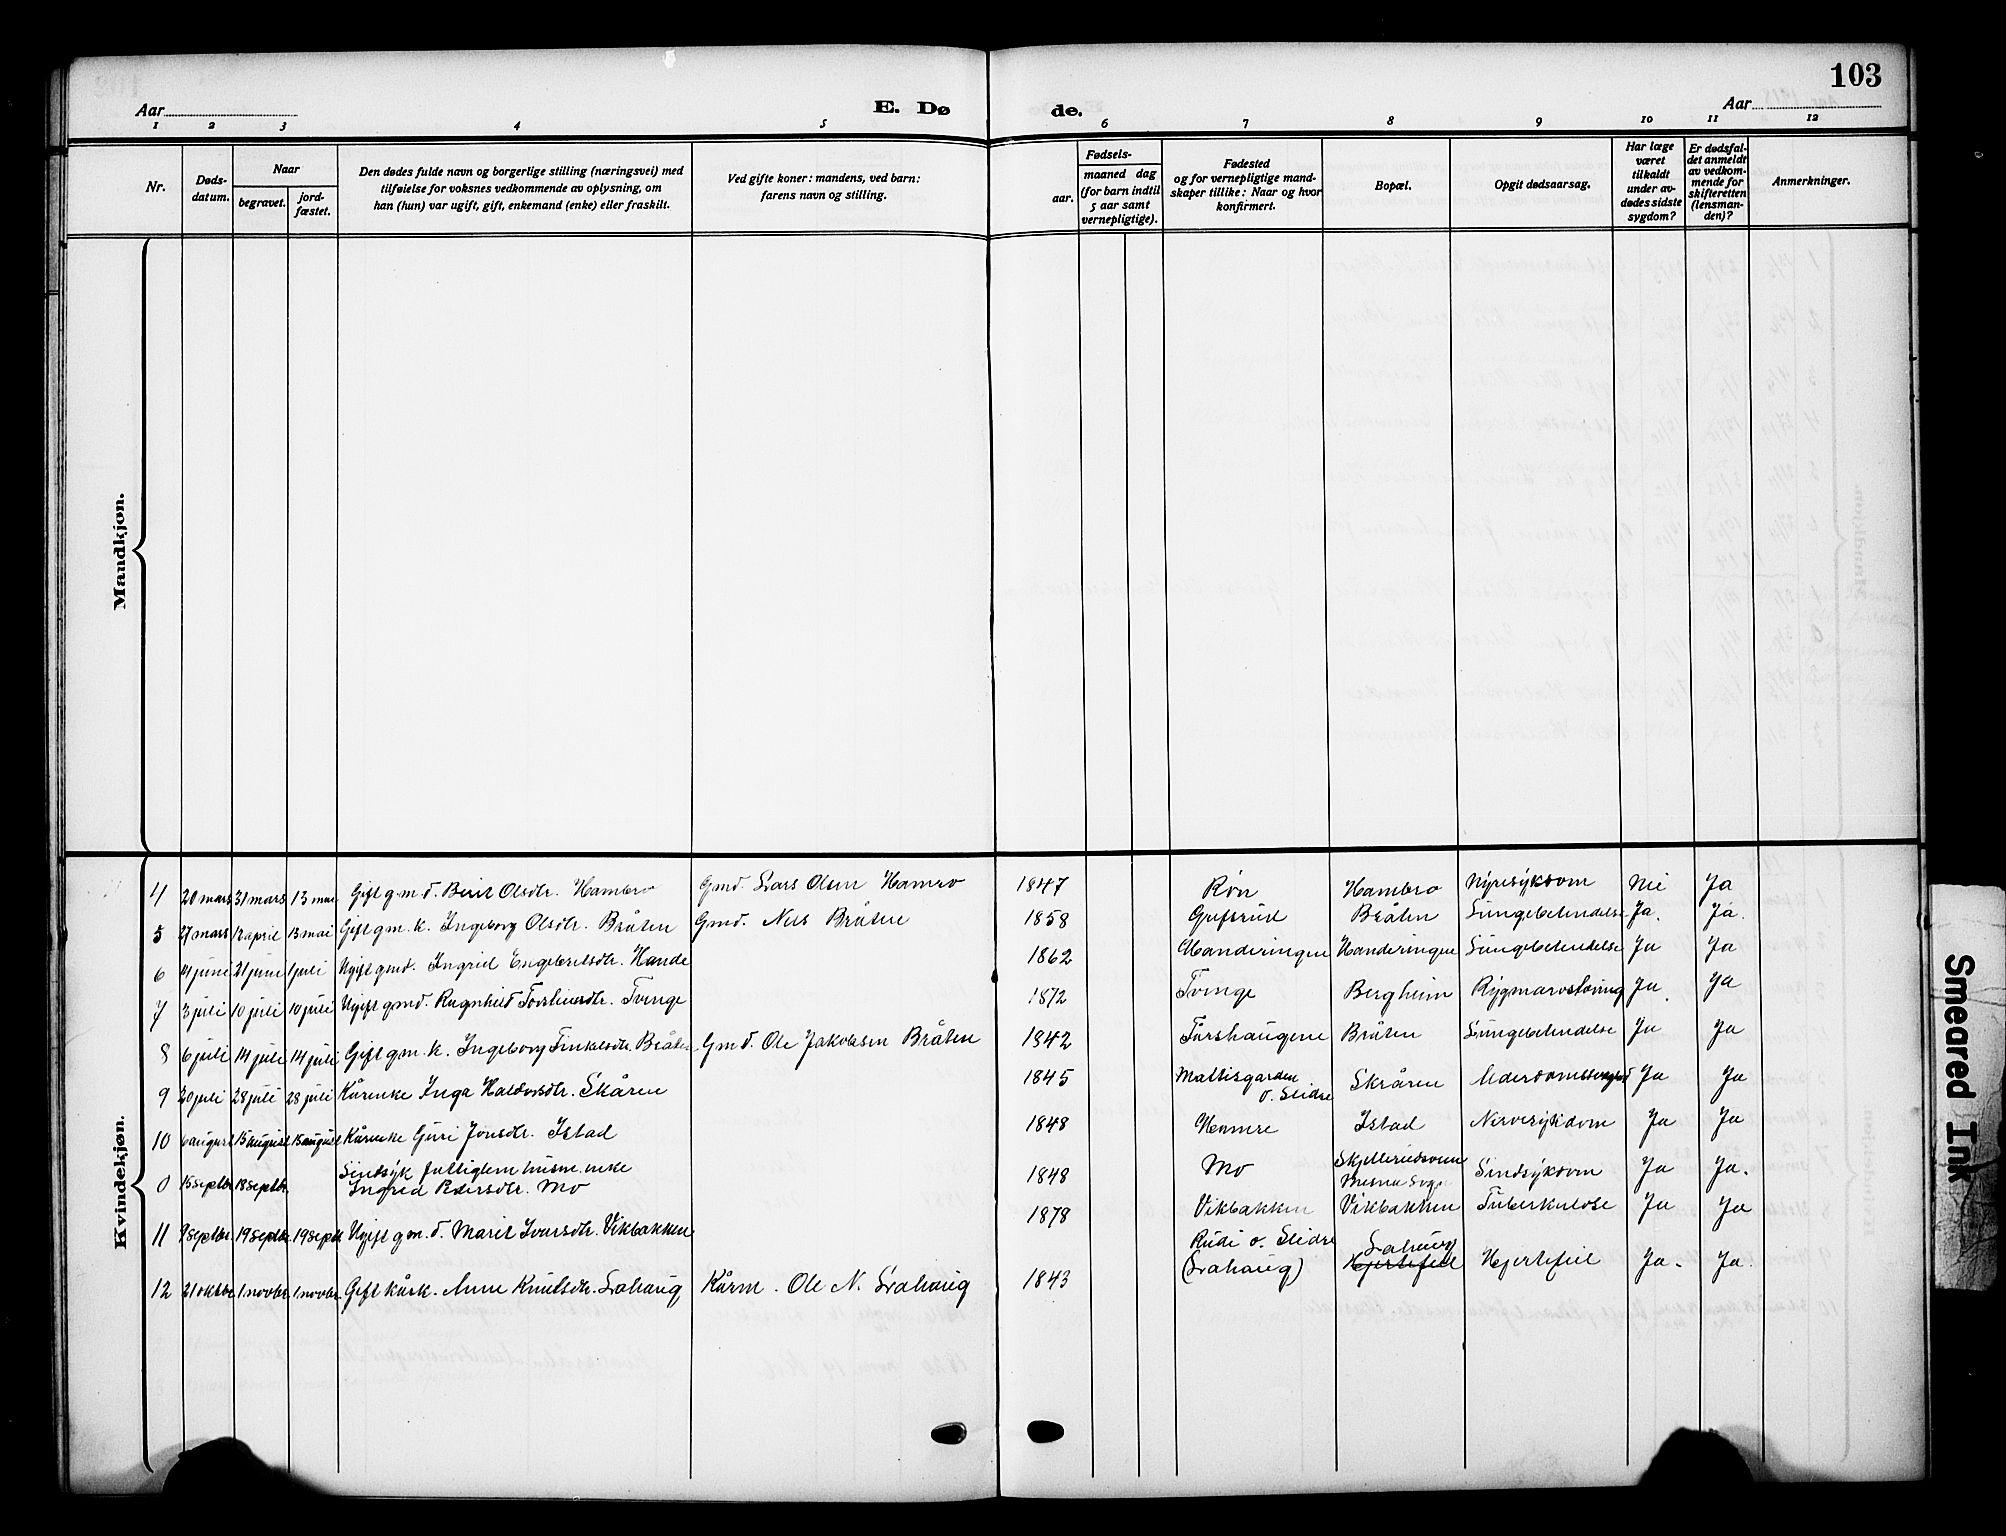 SAH, Vestre Slidre prestekontor, Klokkerbok nr. 7, 1909-1930, s. 103